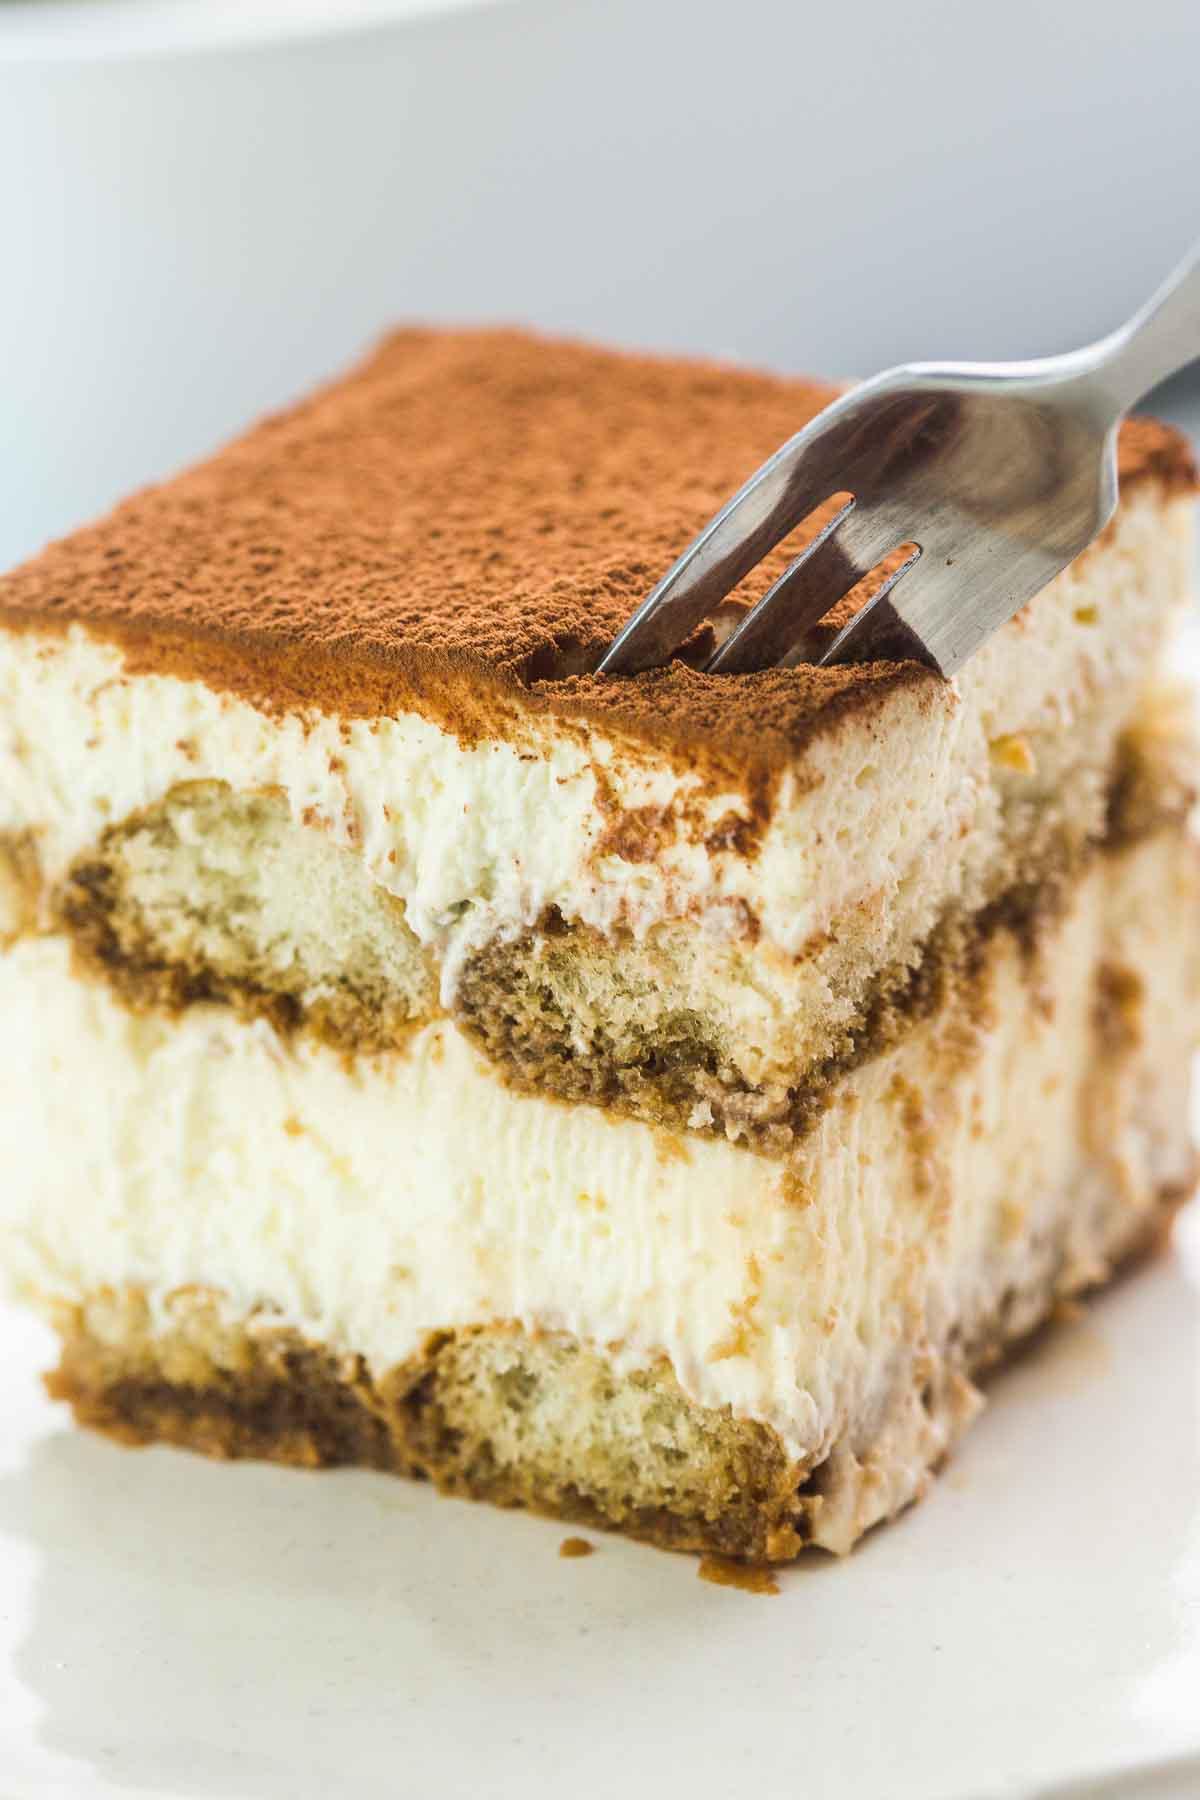 Close up shot of a slice of tiramisu cake, with a fork.